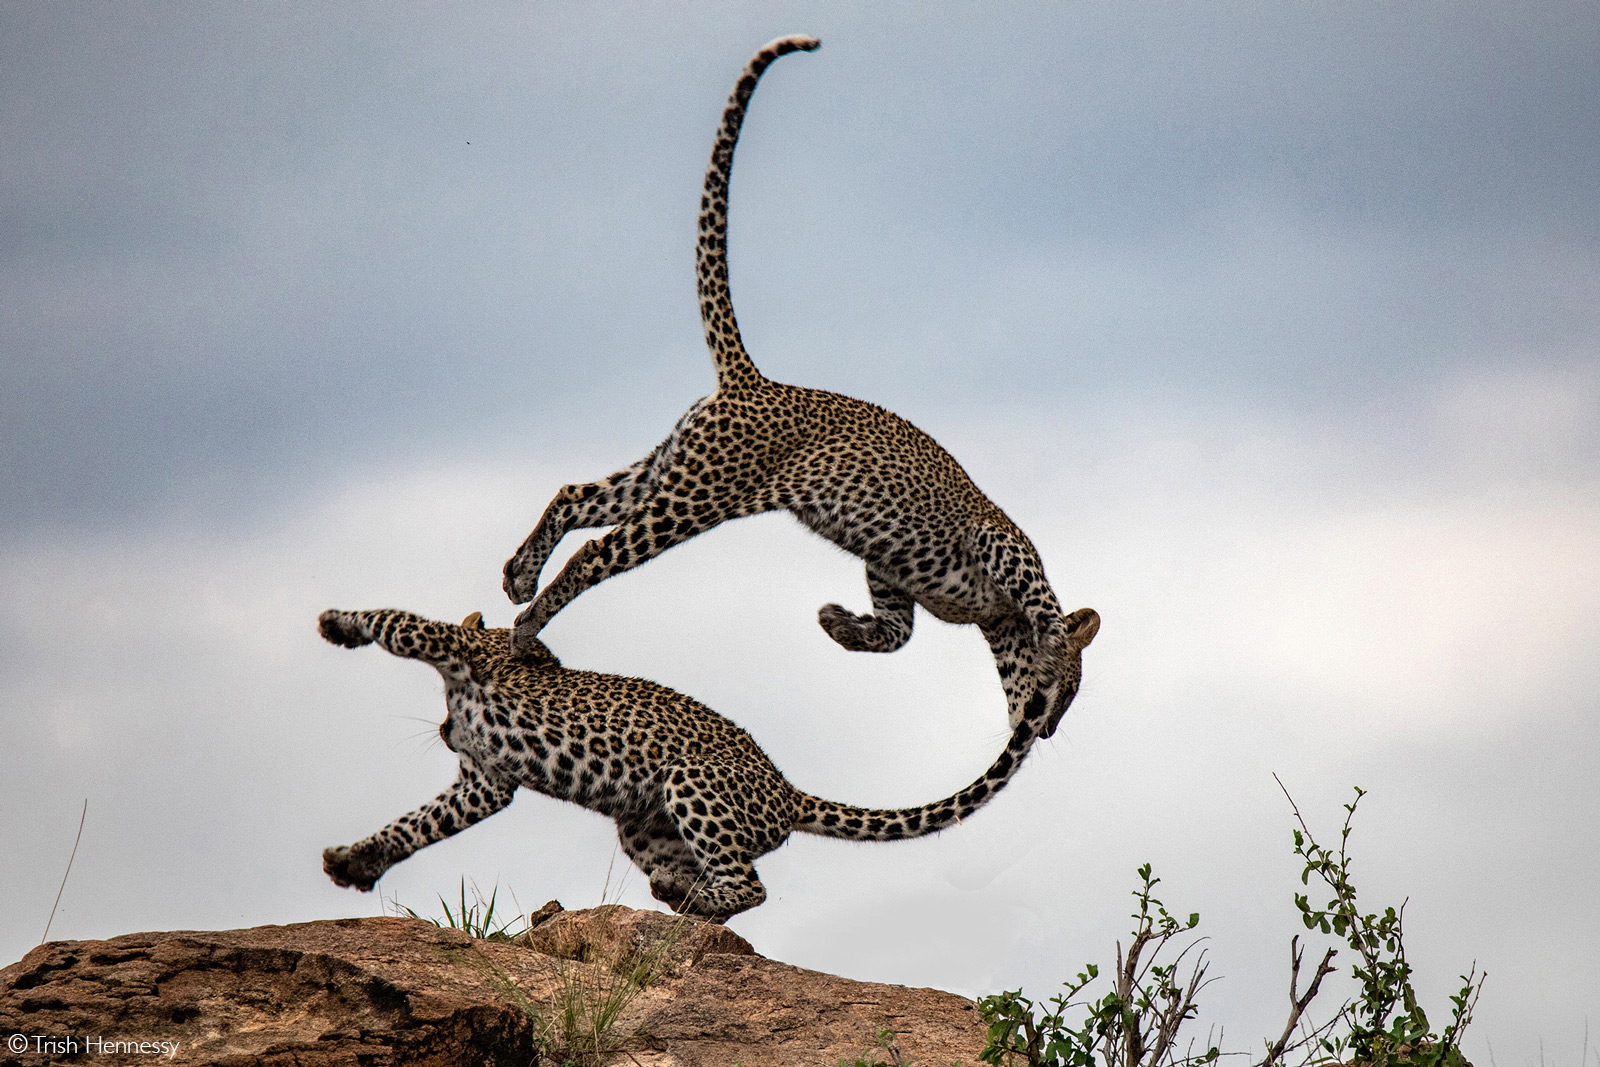 Leopard brothers playing on the rocks. Samburu National Reserve, Kenya © Trish Hennessy